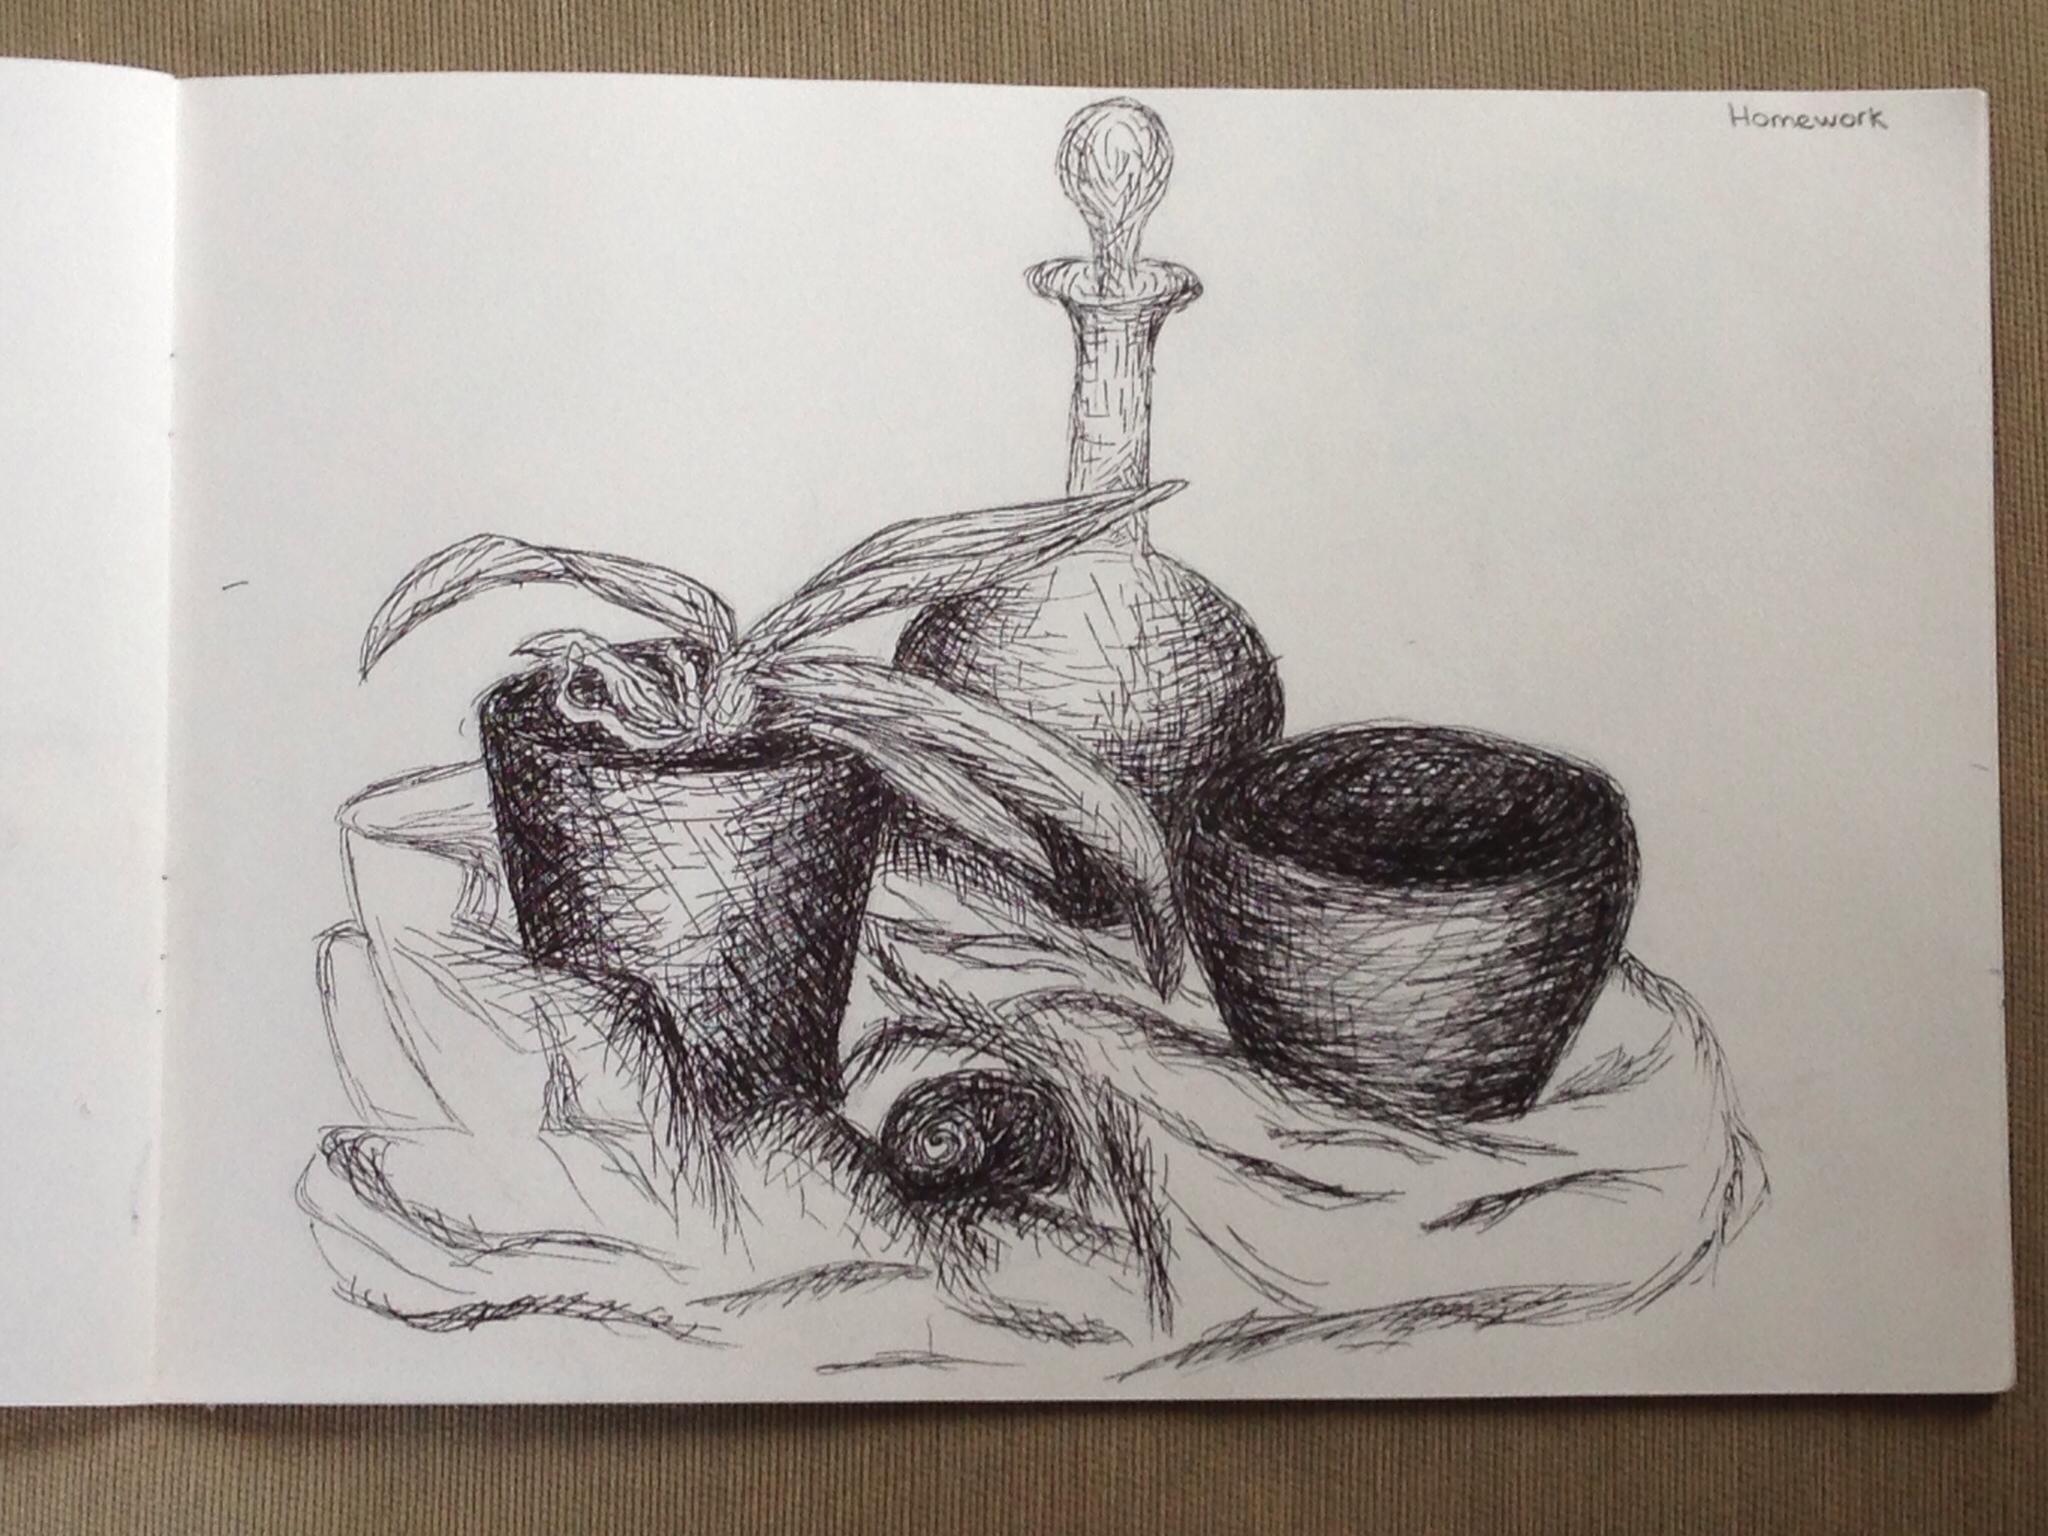 Drawn teacup cross hatching #7